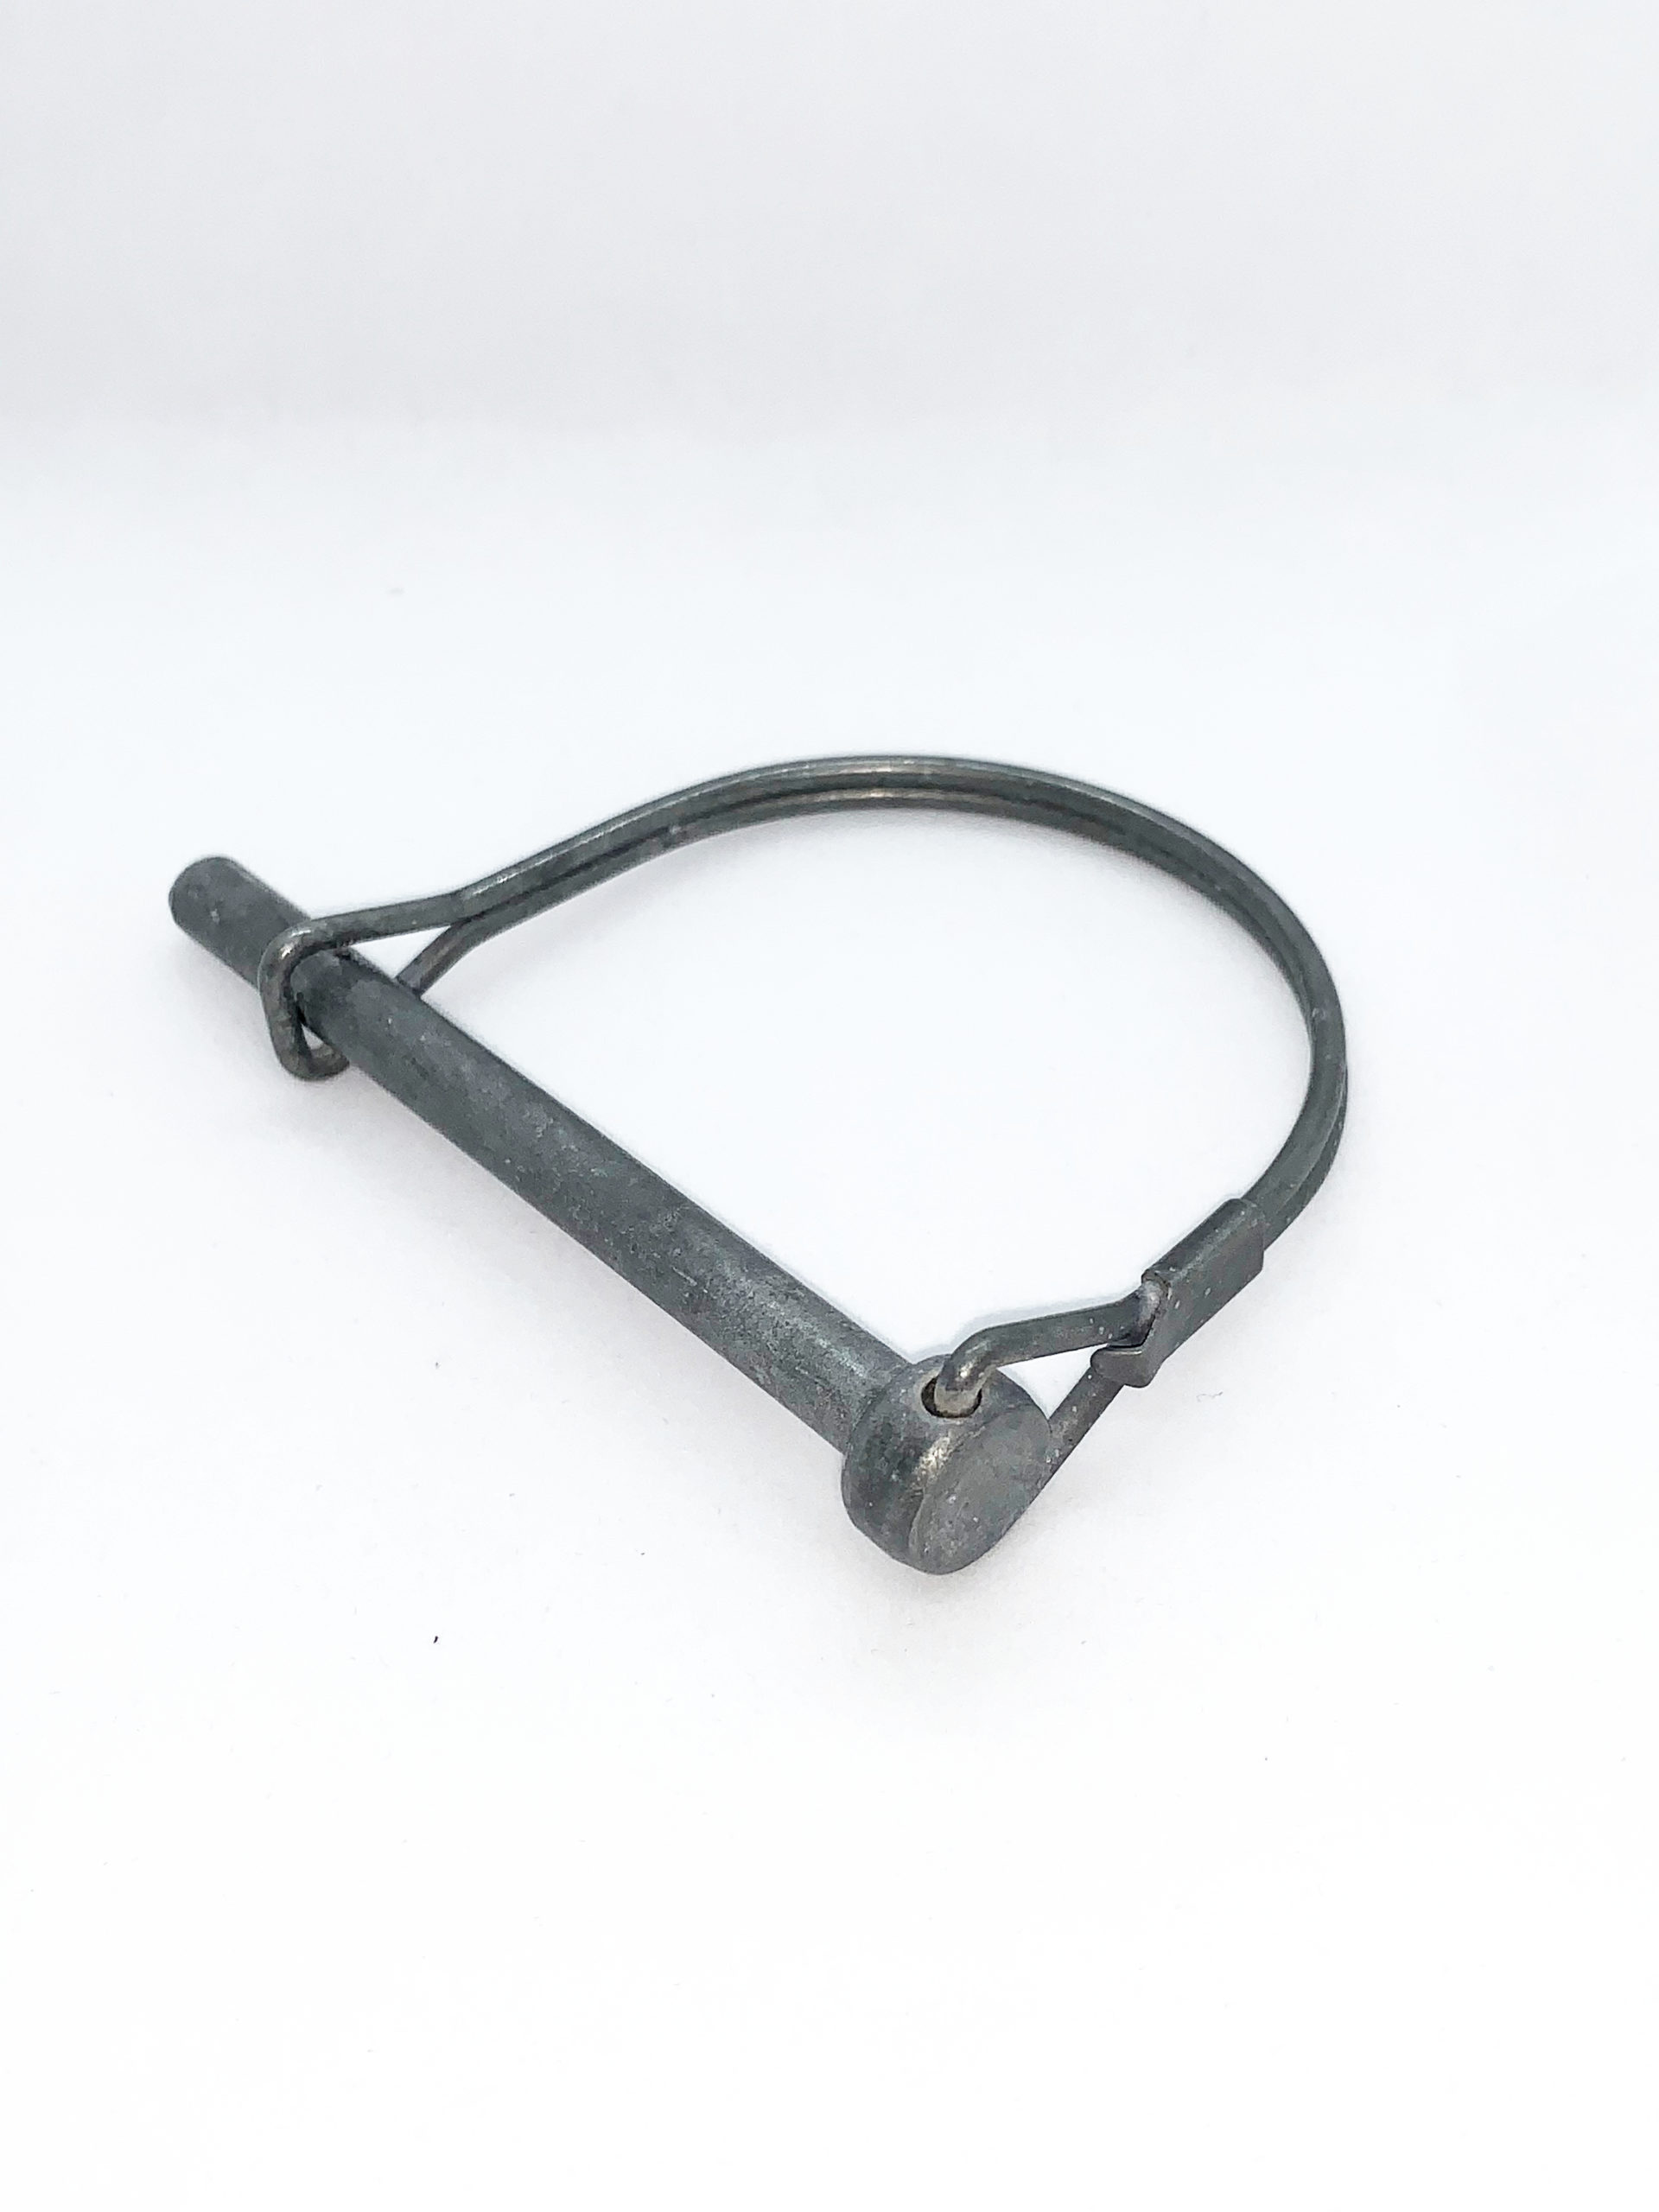 coupler-lockpin